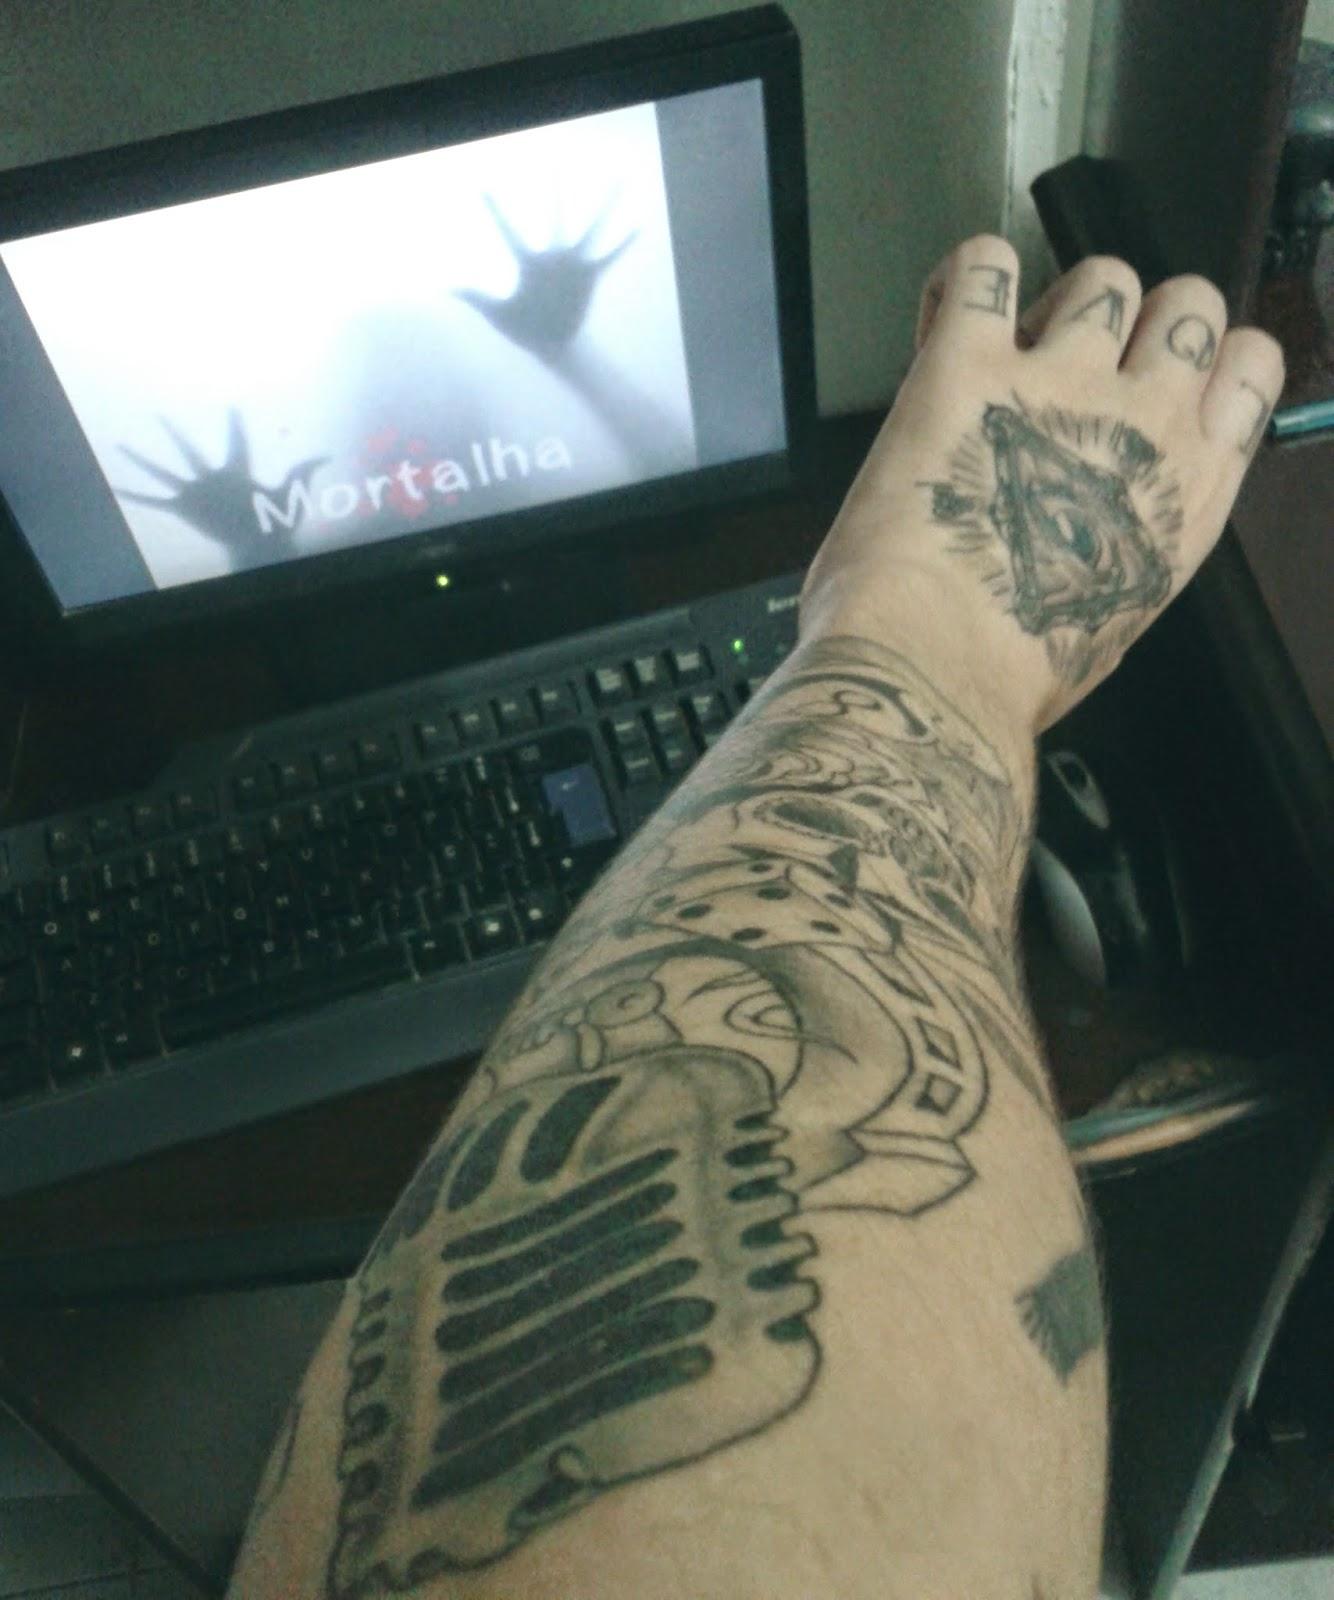 tatuagem, david alves mendes